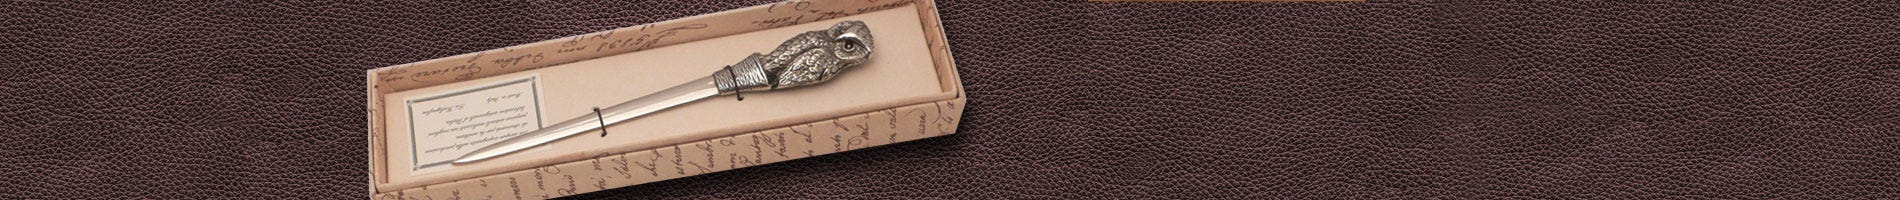 coles pewter letter opener owl design